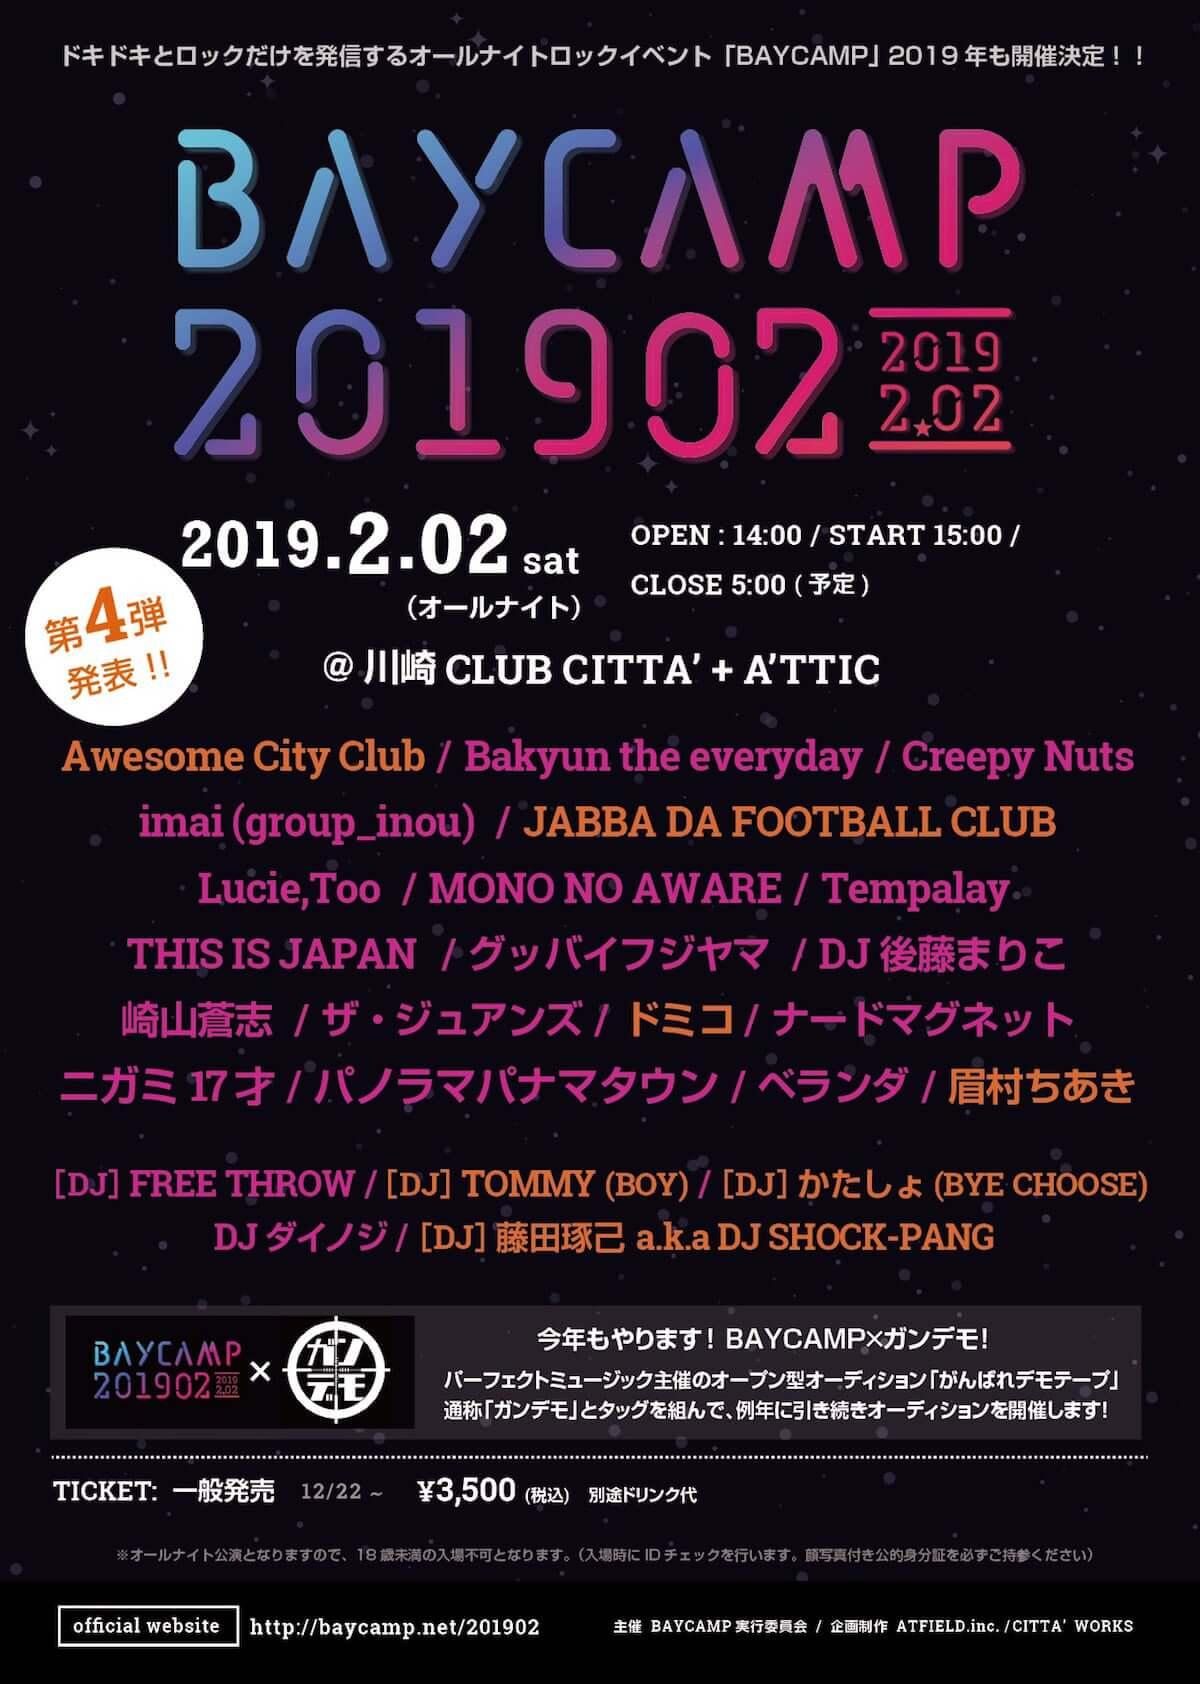 BAYCAMP 第4段でAwesome City Club 、ドミコ、JABBA DA FOOTBALL CLUBら7組追加 music181221_baycamp2019_01-1200x1684